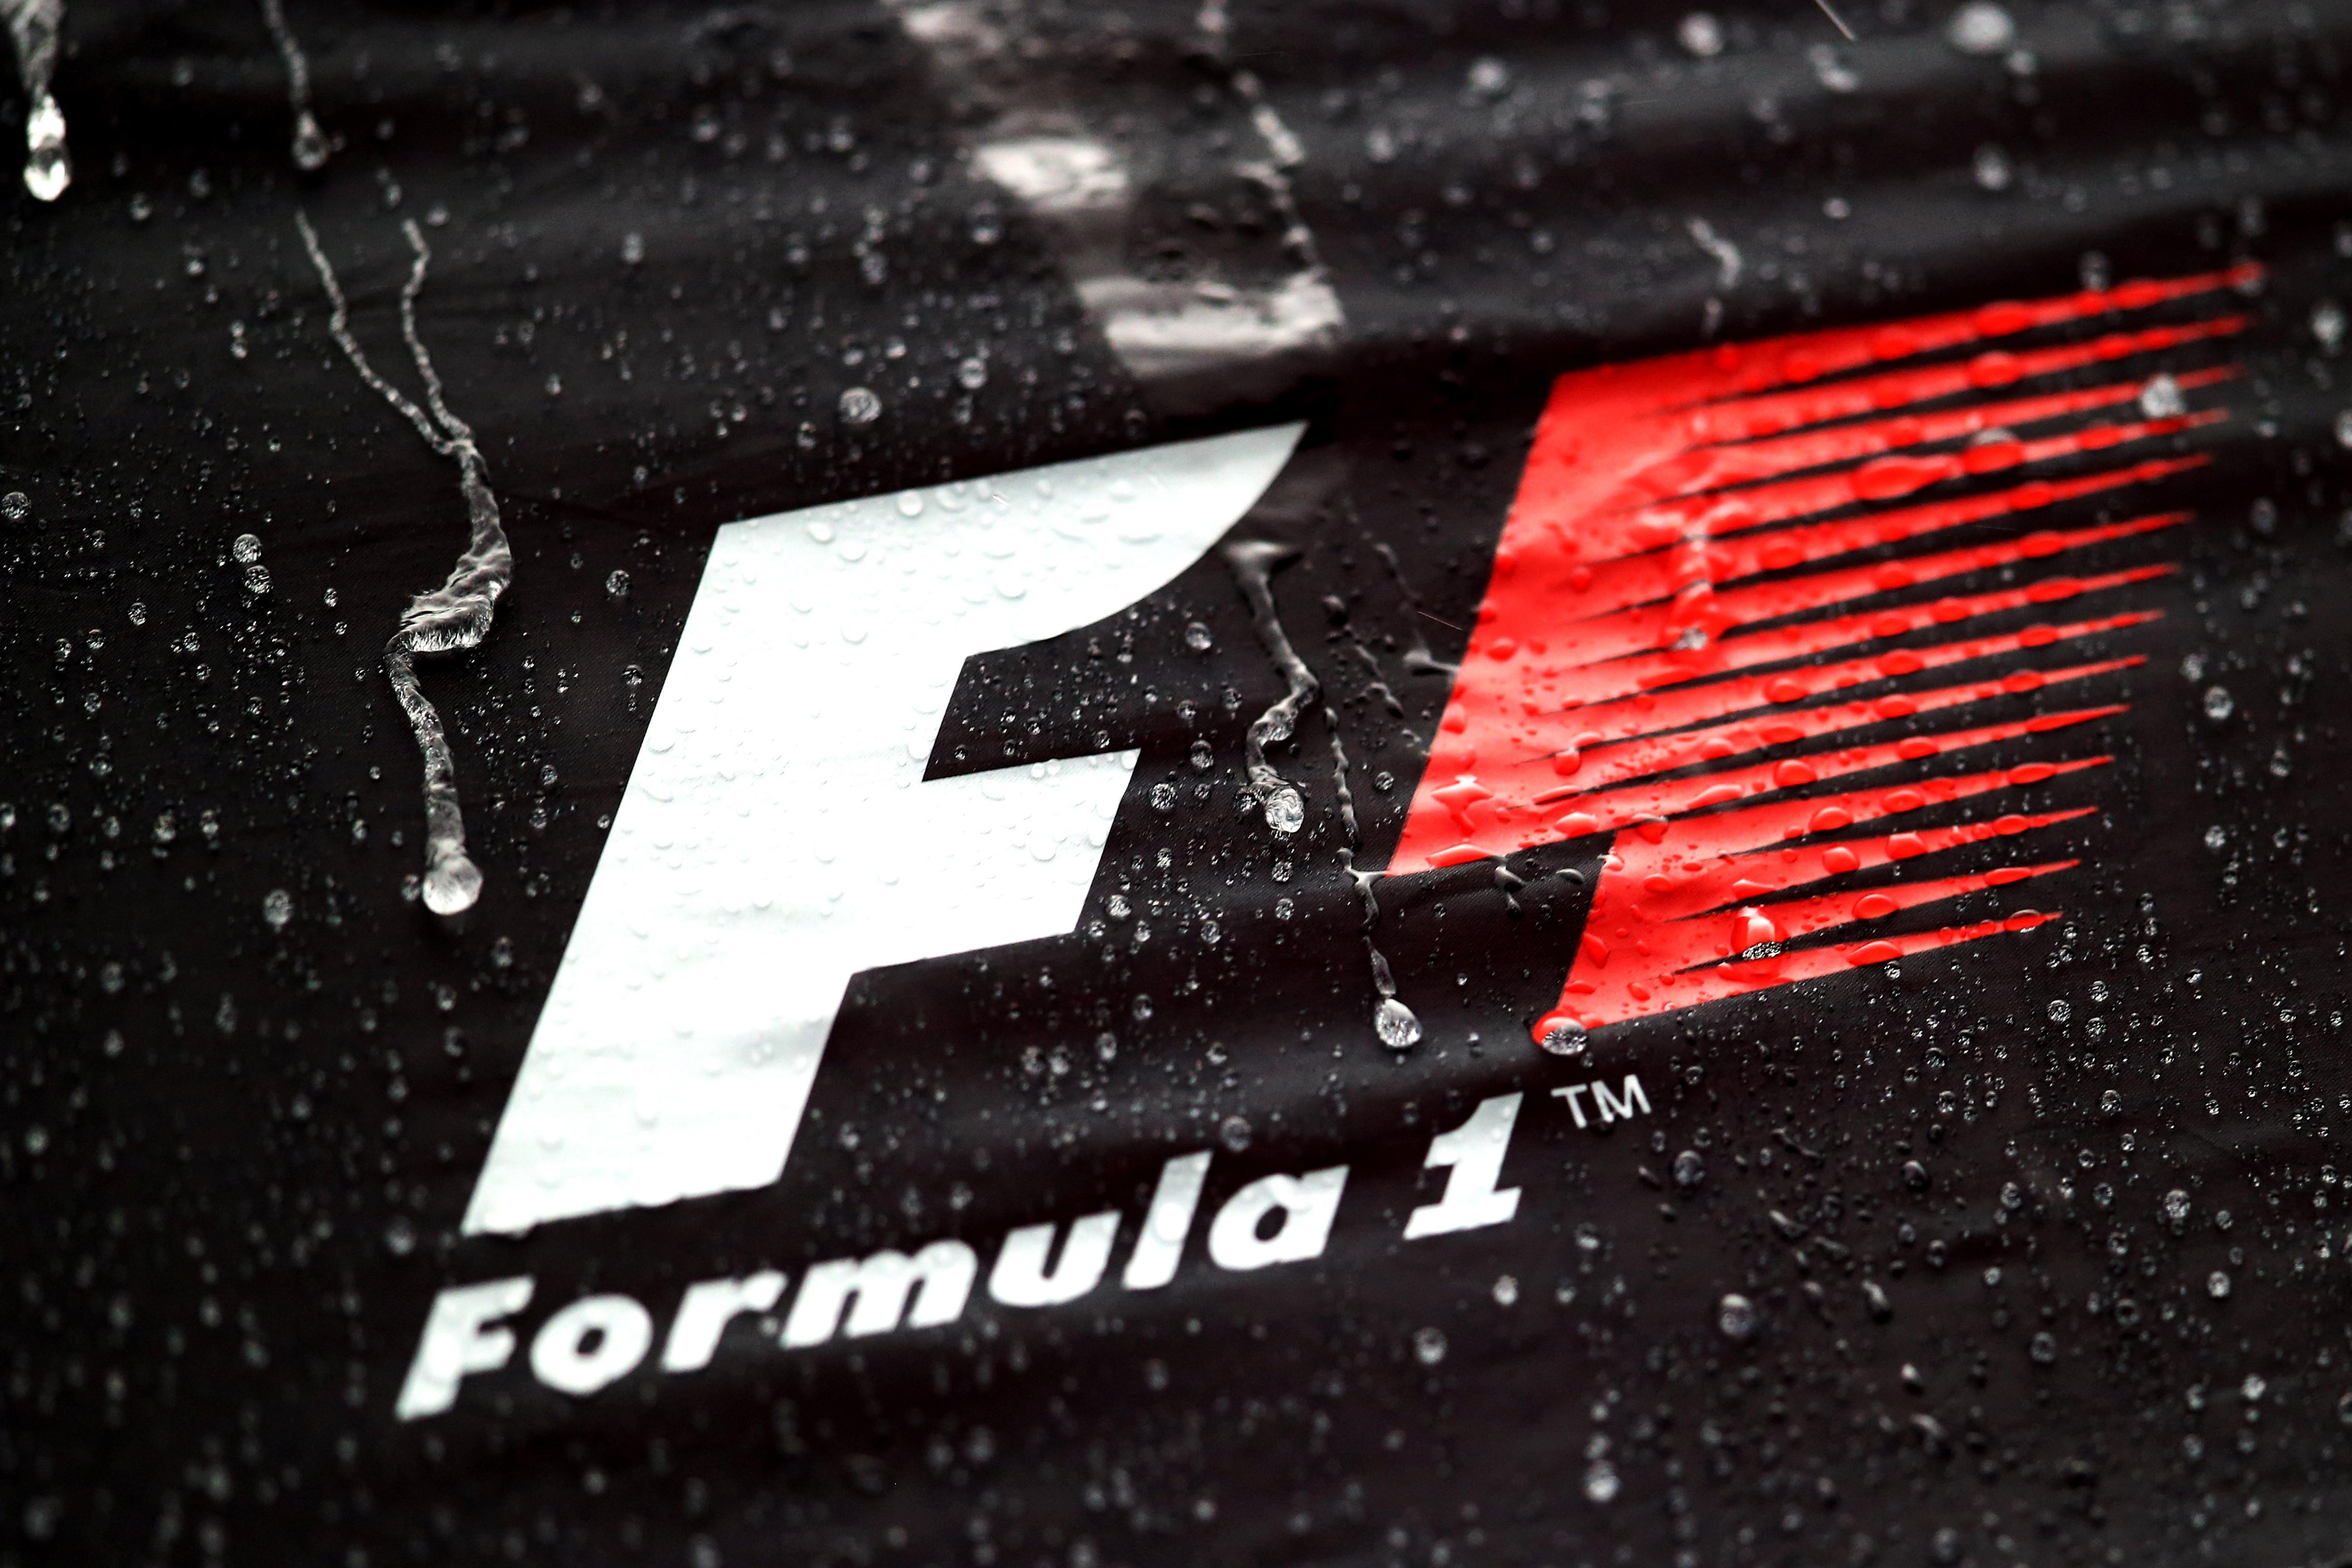 Wallpaper : black, monochrome, red, logo, Formula 1, brand ...